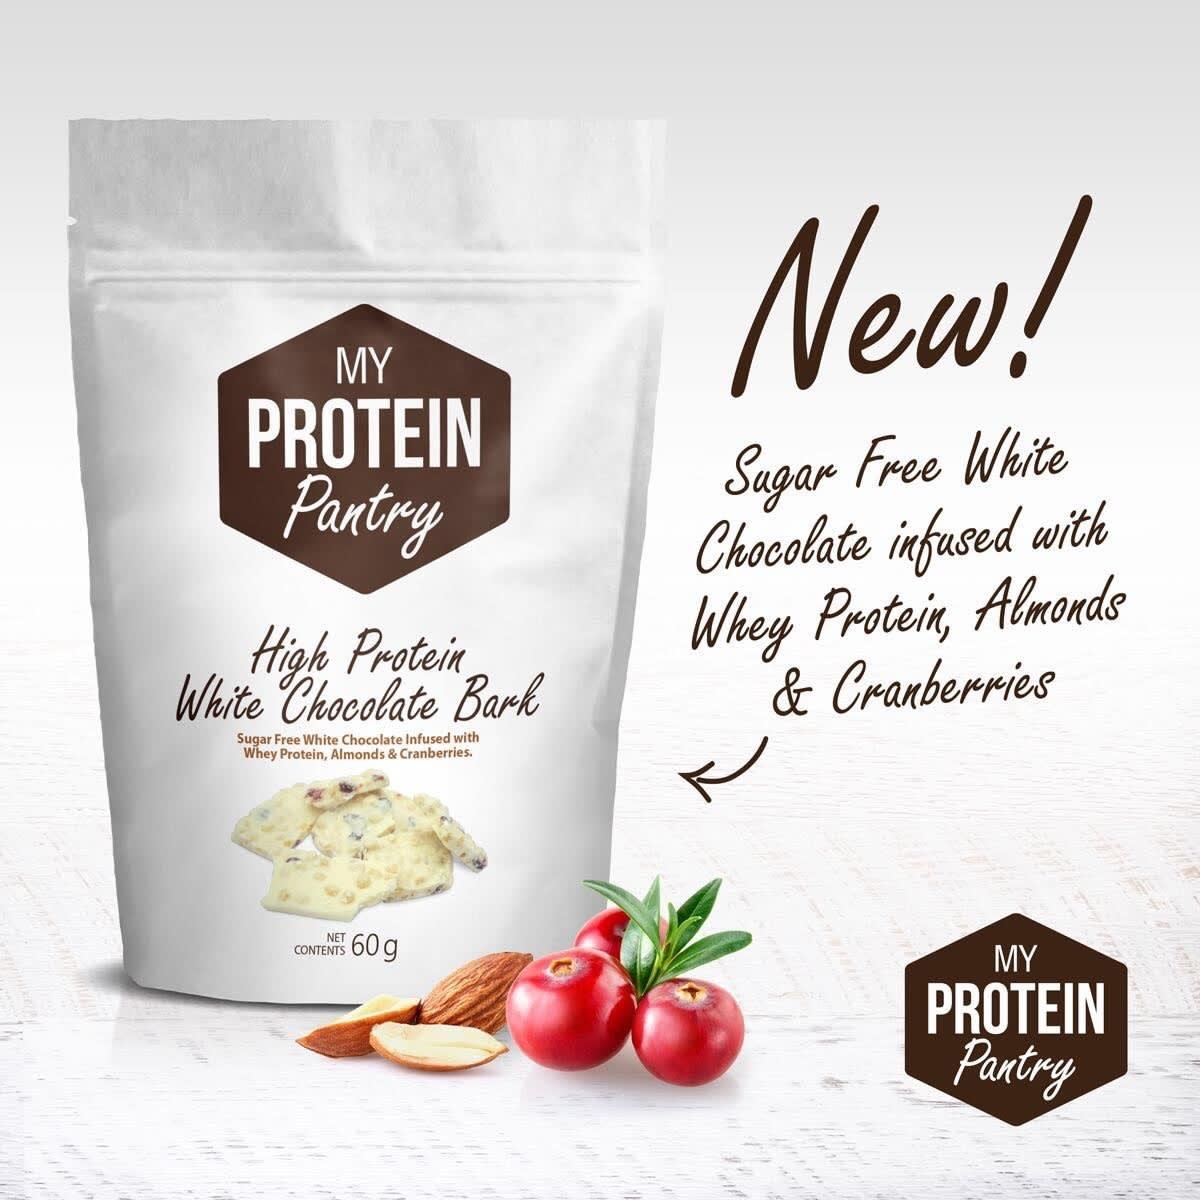 My Protein Pantry white chocolate bark